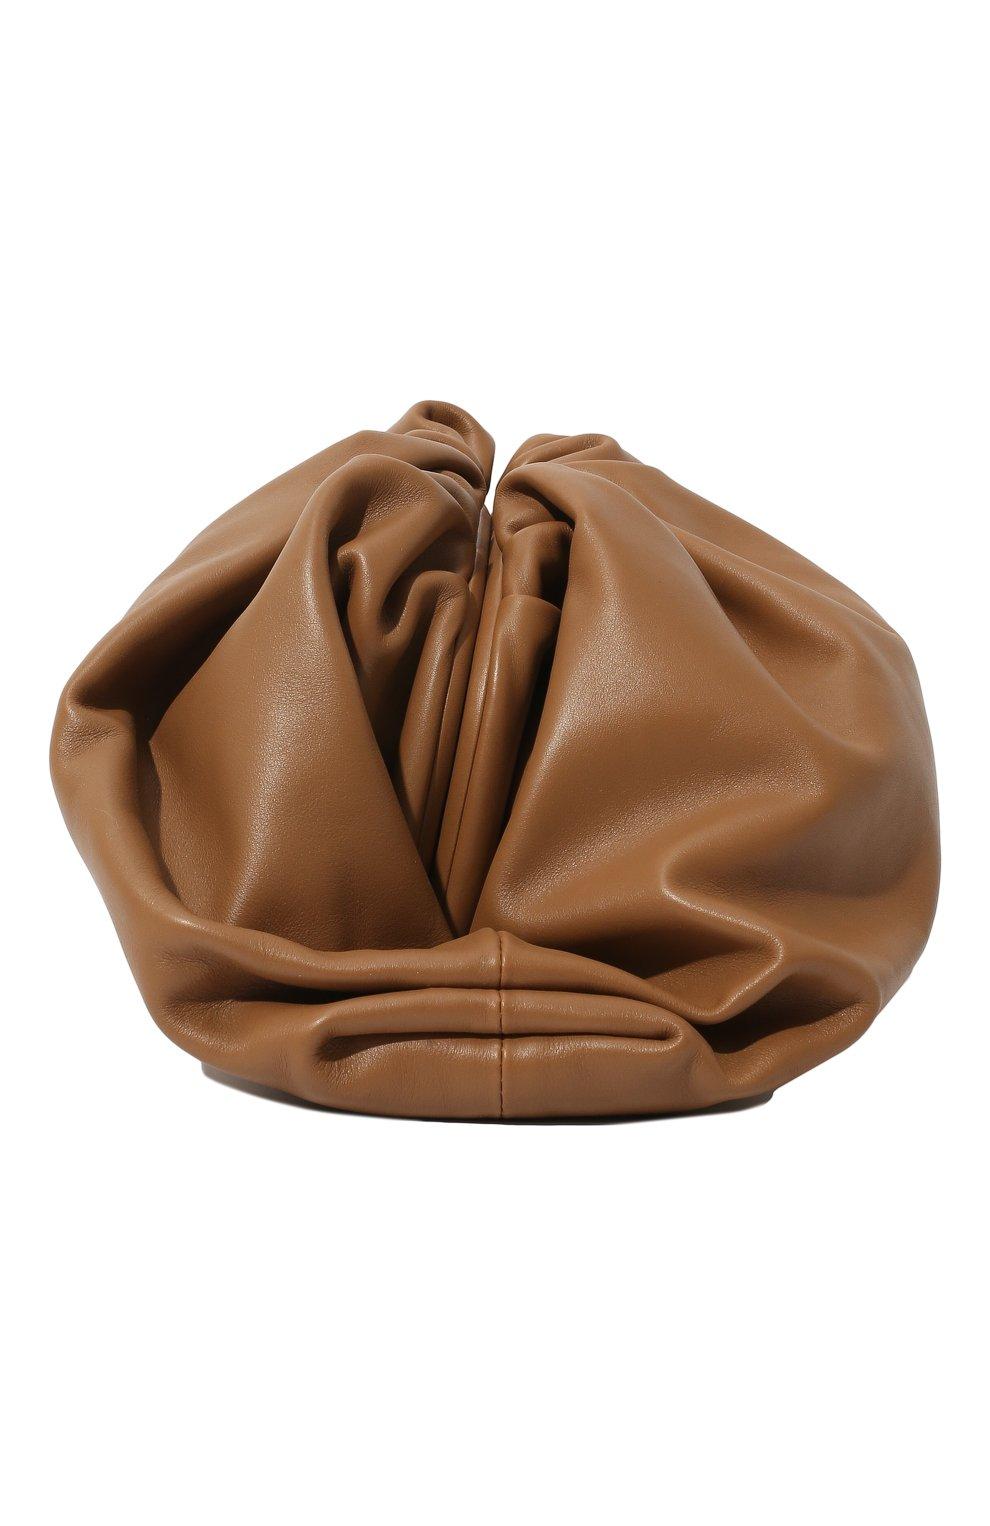 Женский клатч pouch BOTTEGA VENETA бежевого цвета, арт. 576227/VCP40   Фото 4